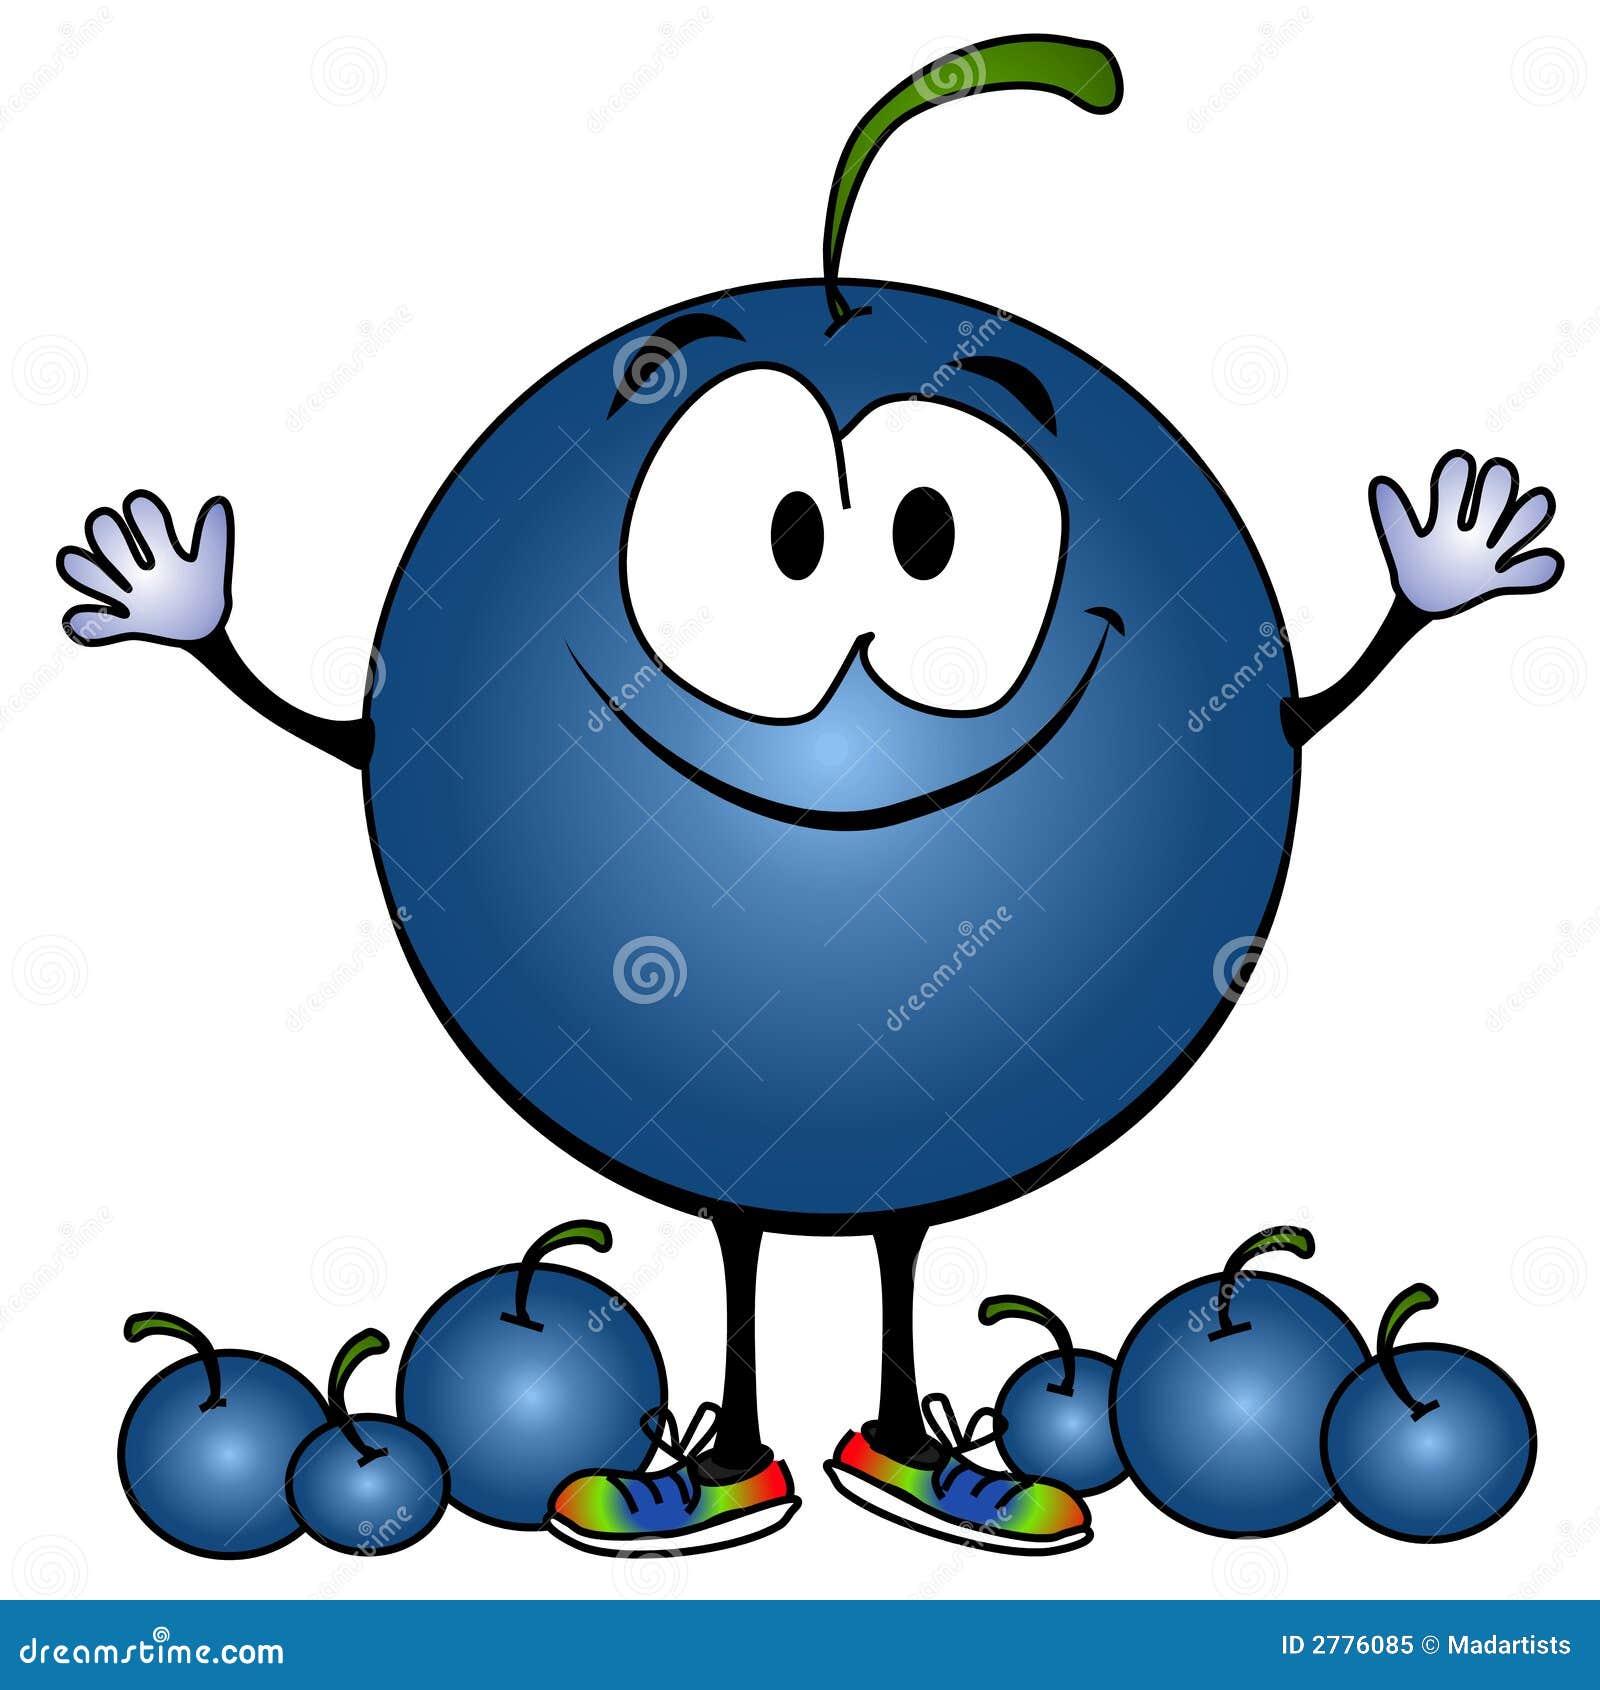 Smiling Blueberry Cartoon Face Royalty Free Stock Photo ...